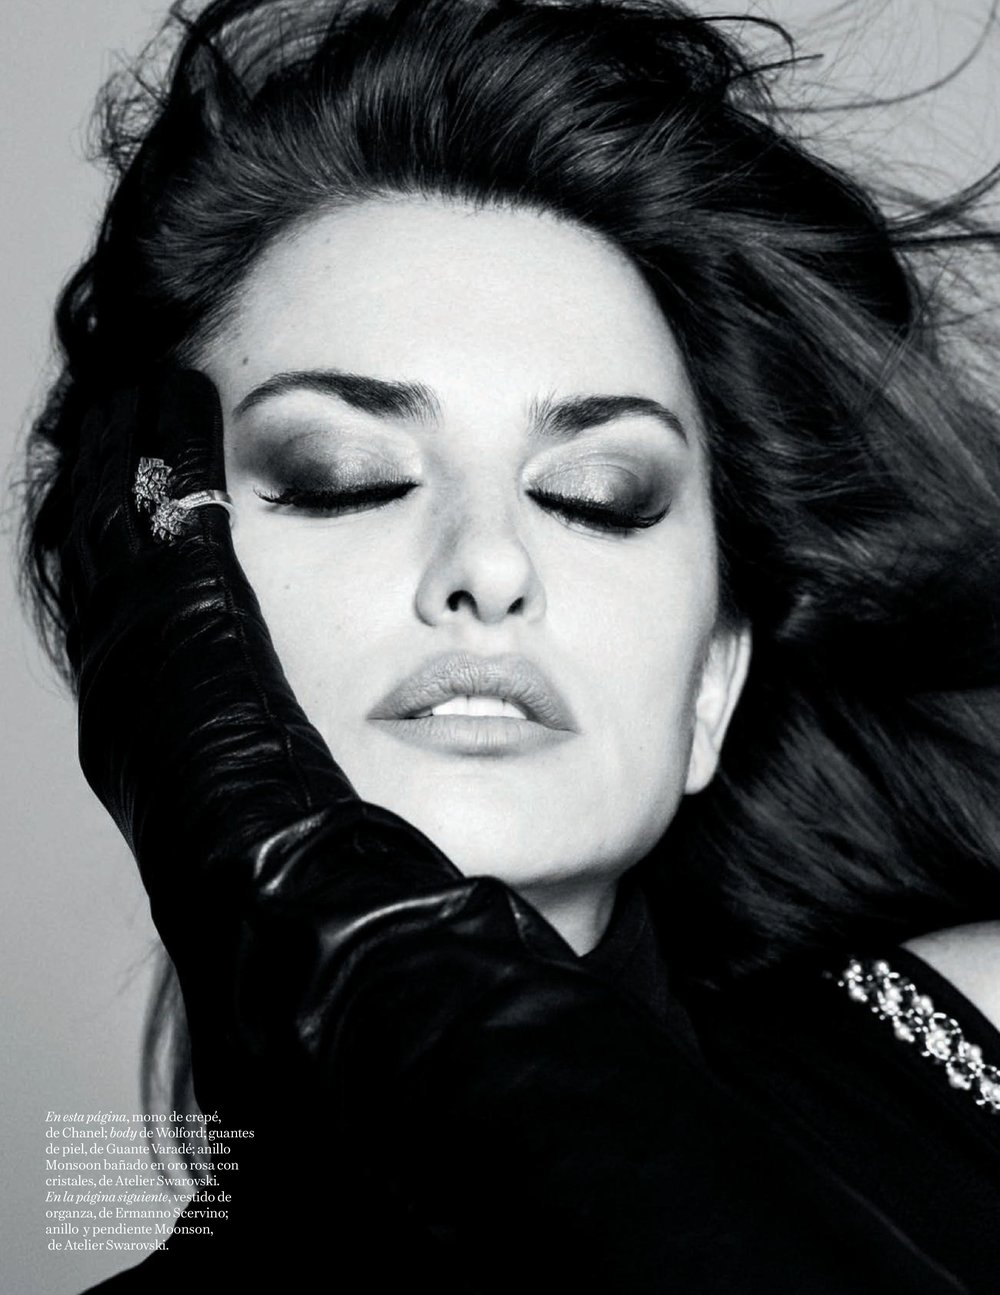 Penelope-Cruz-Luigi-Iango-Vogue-Spain-April-2019- (5).jpg